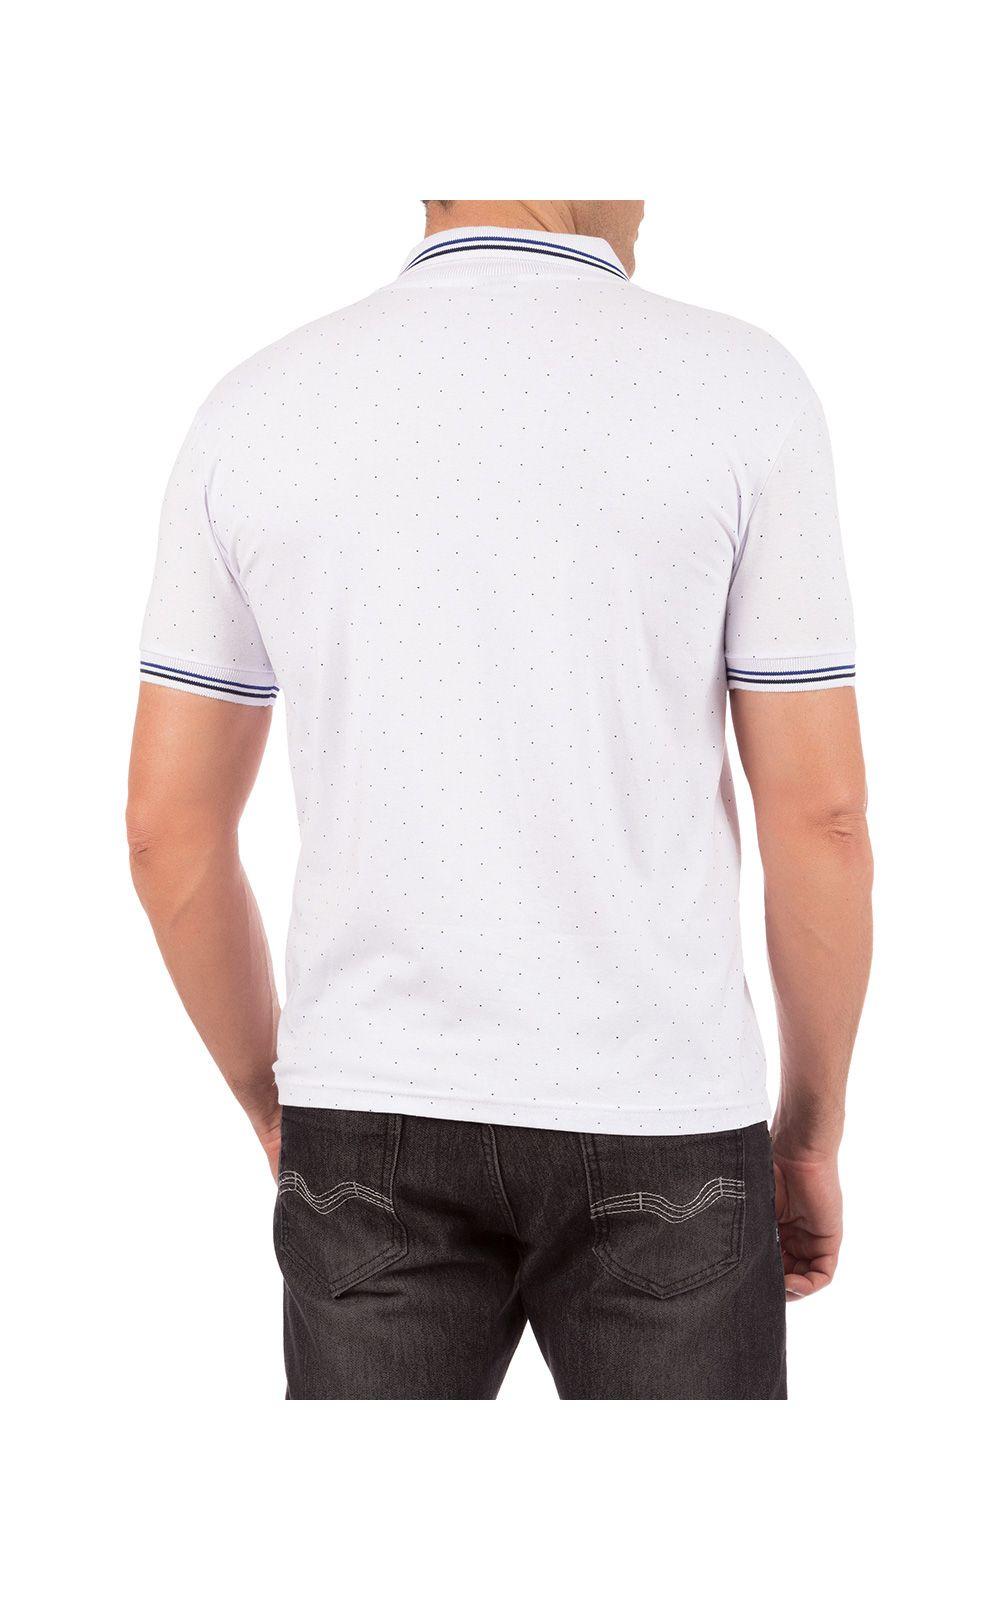 Foto 2 - Camisa Polo Masculina Branca Estampada